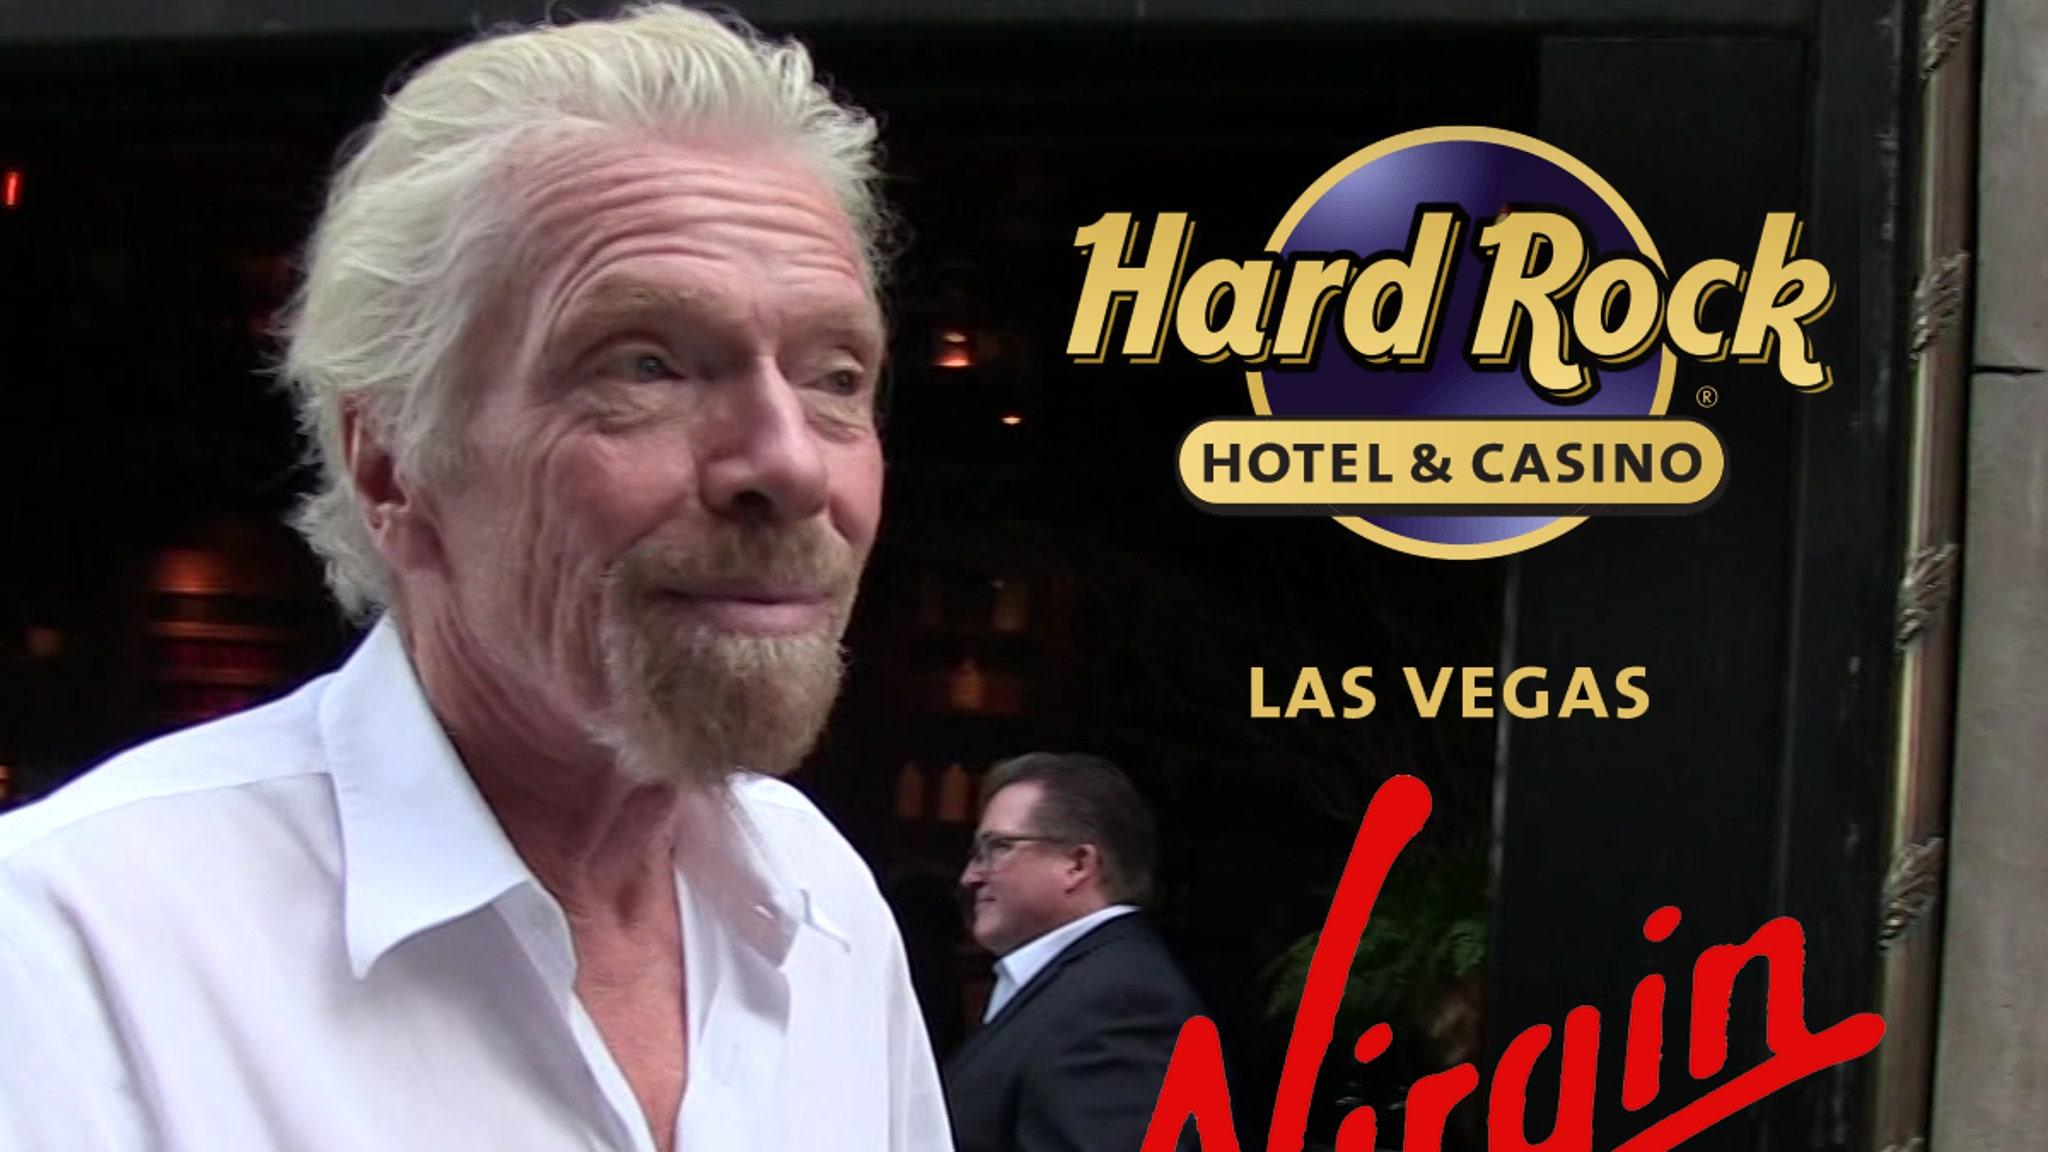 Bolts richard branson buys hard rock casino, bringing virgin to vegas Baking Joliet play free european roulette game online